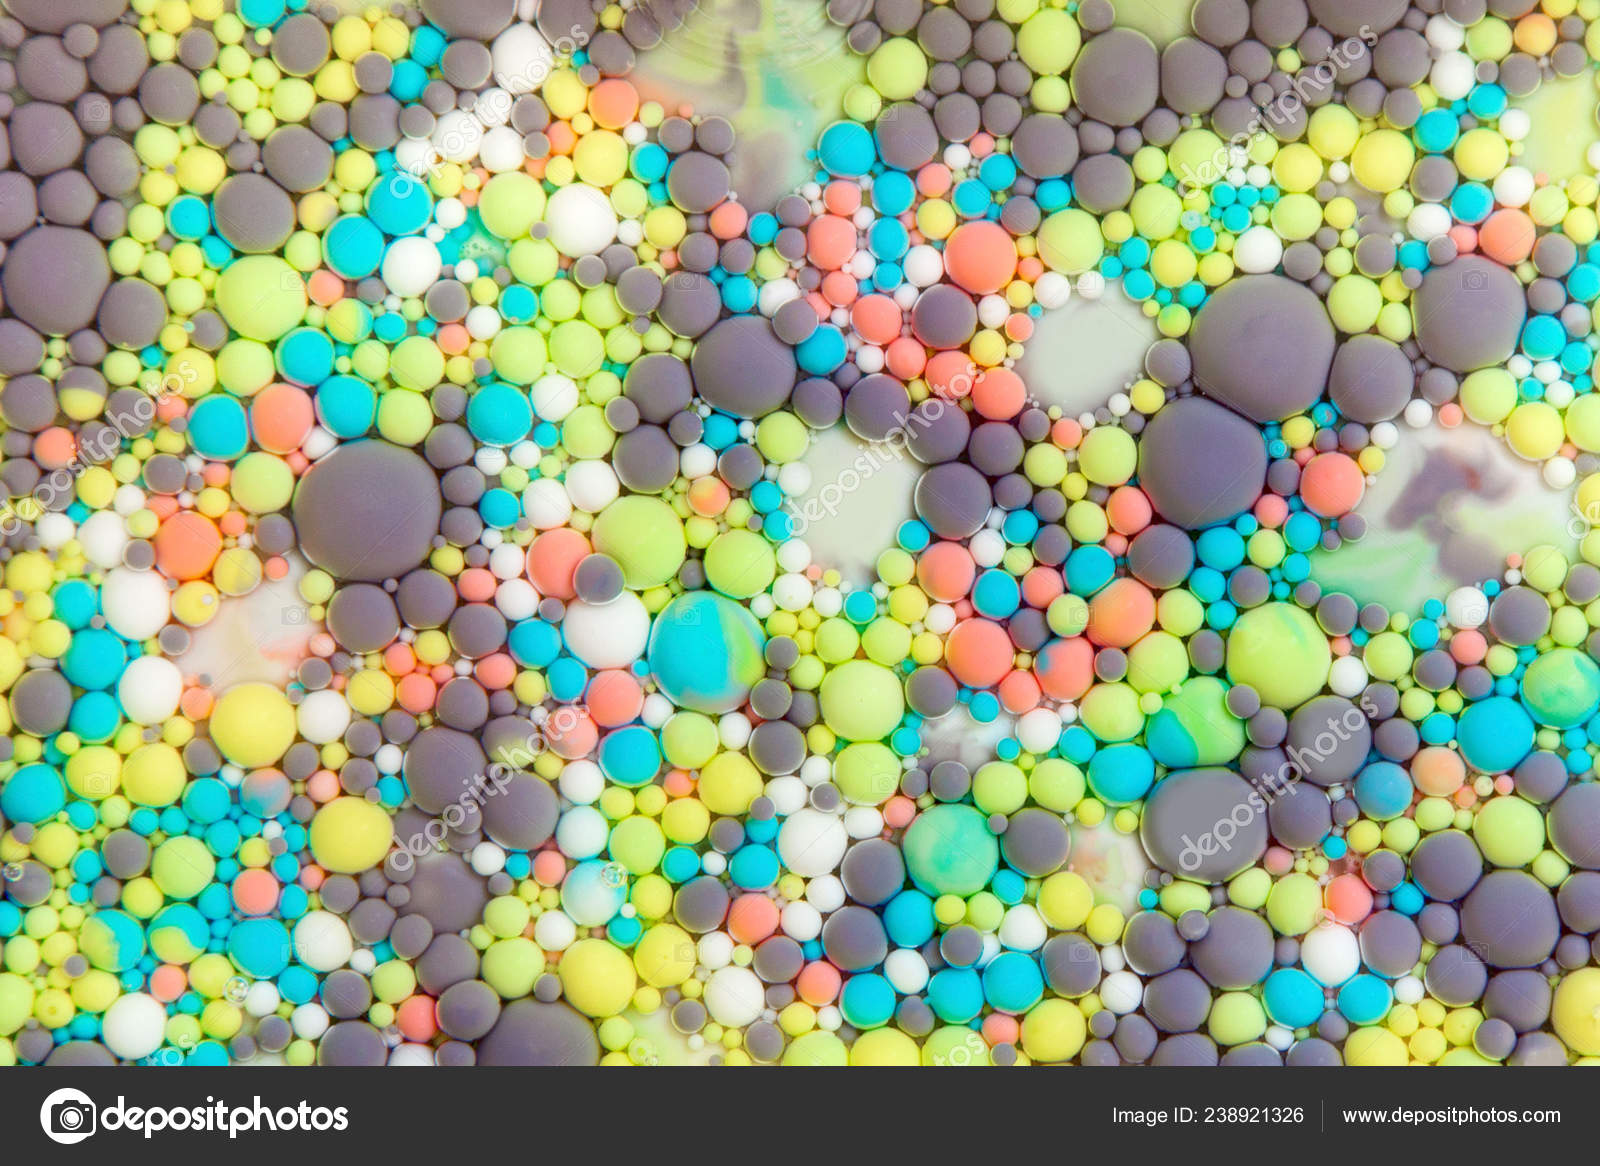 Wallpapers Bubbles Multicolored Molecules Atoms Color Universe Wallpapers Soap Bubbles Stock Photo C Dalivl Yandex Ru 238921326